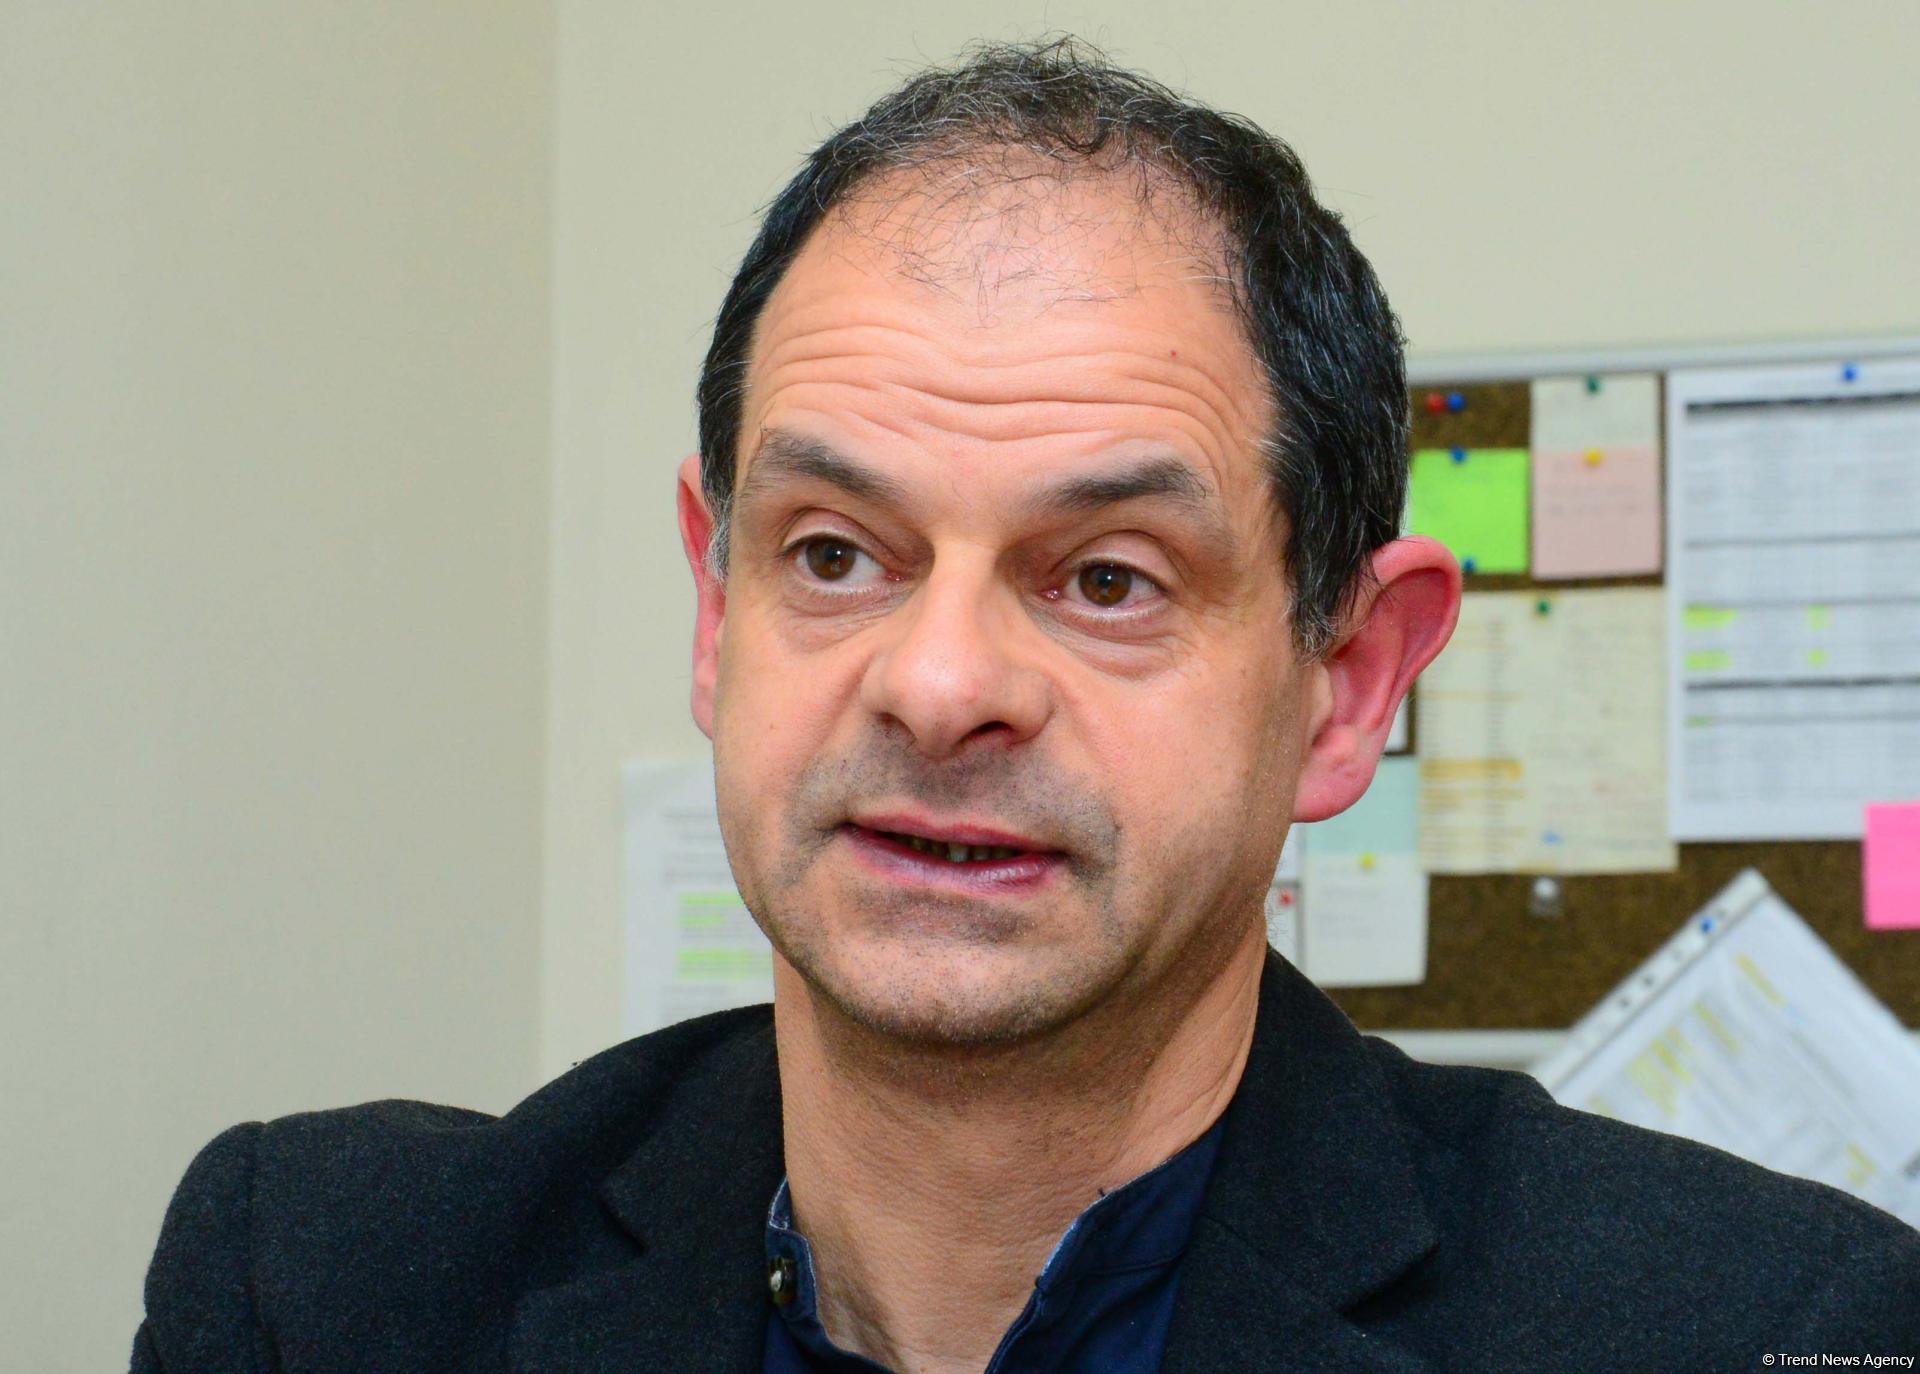 UNFPA eksperti: Demoqrafik keçid Azərbaycanda hamar olacaq (FOTO)